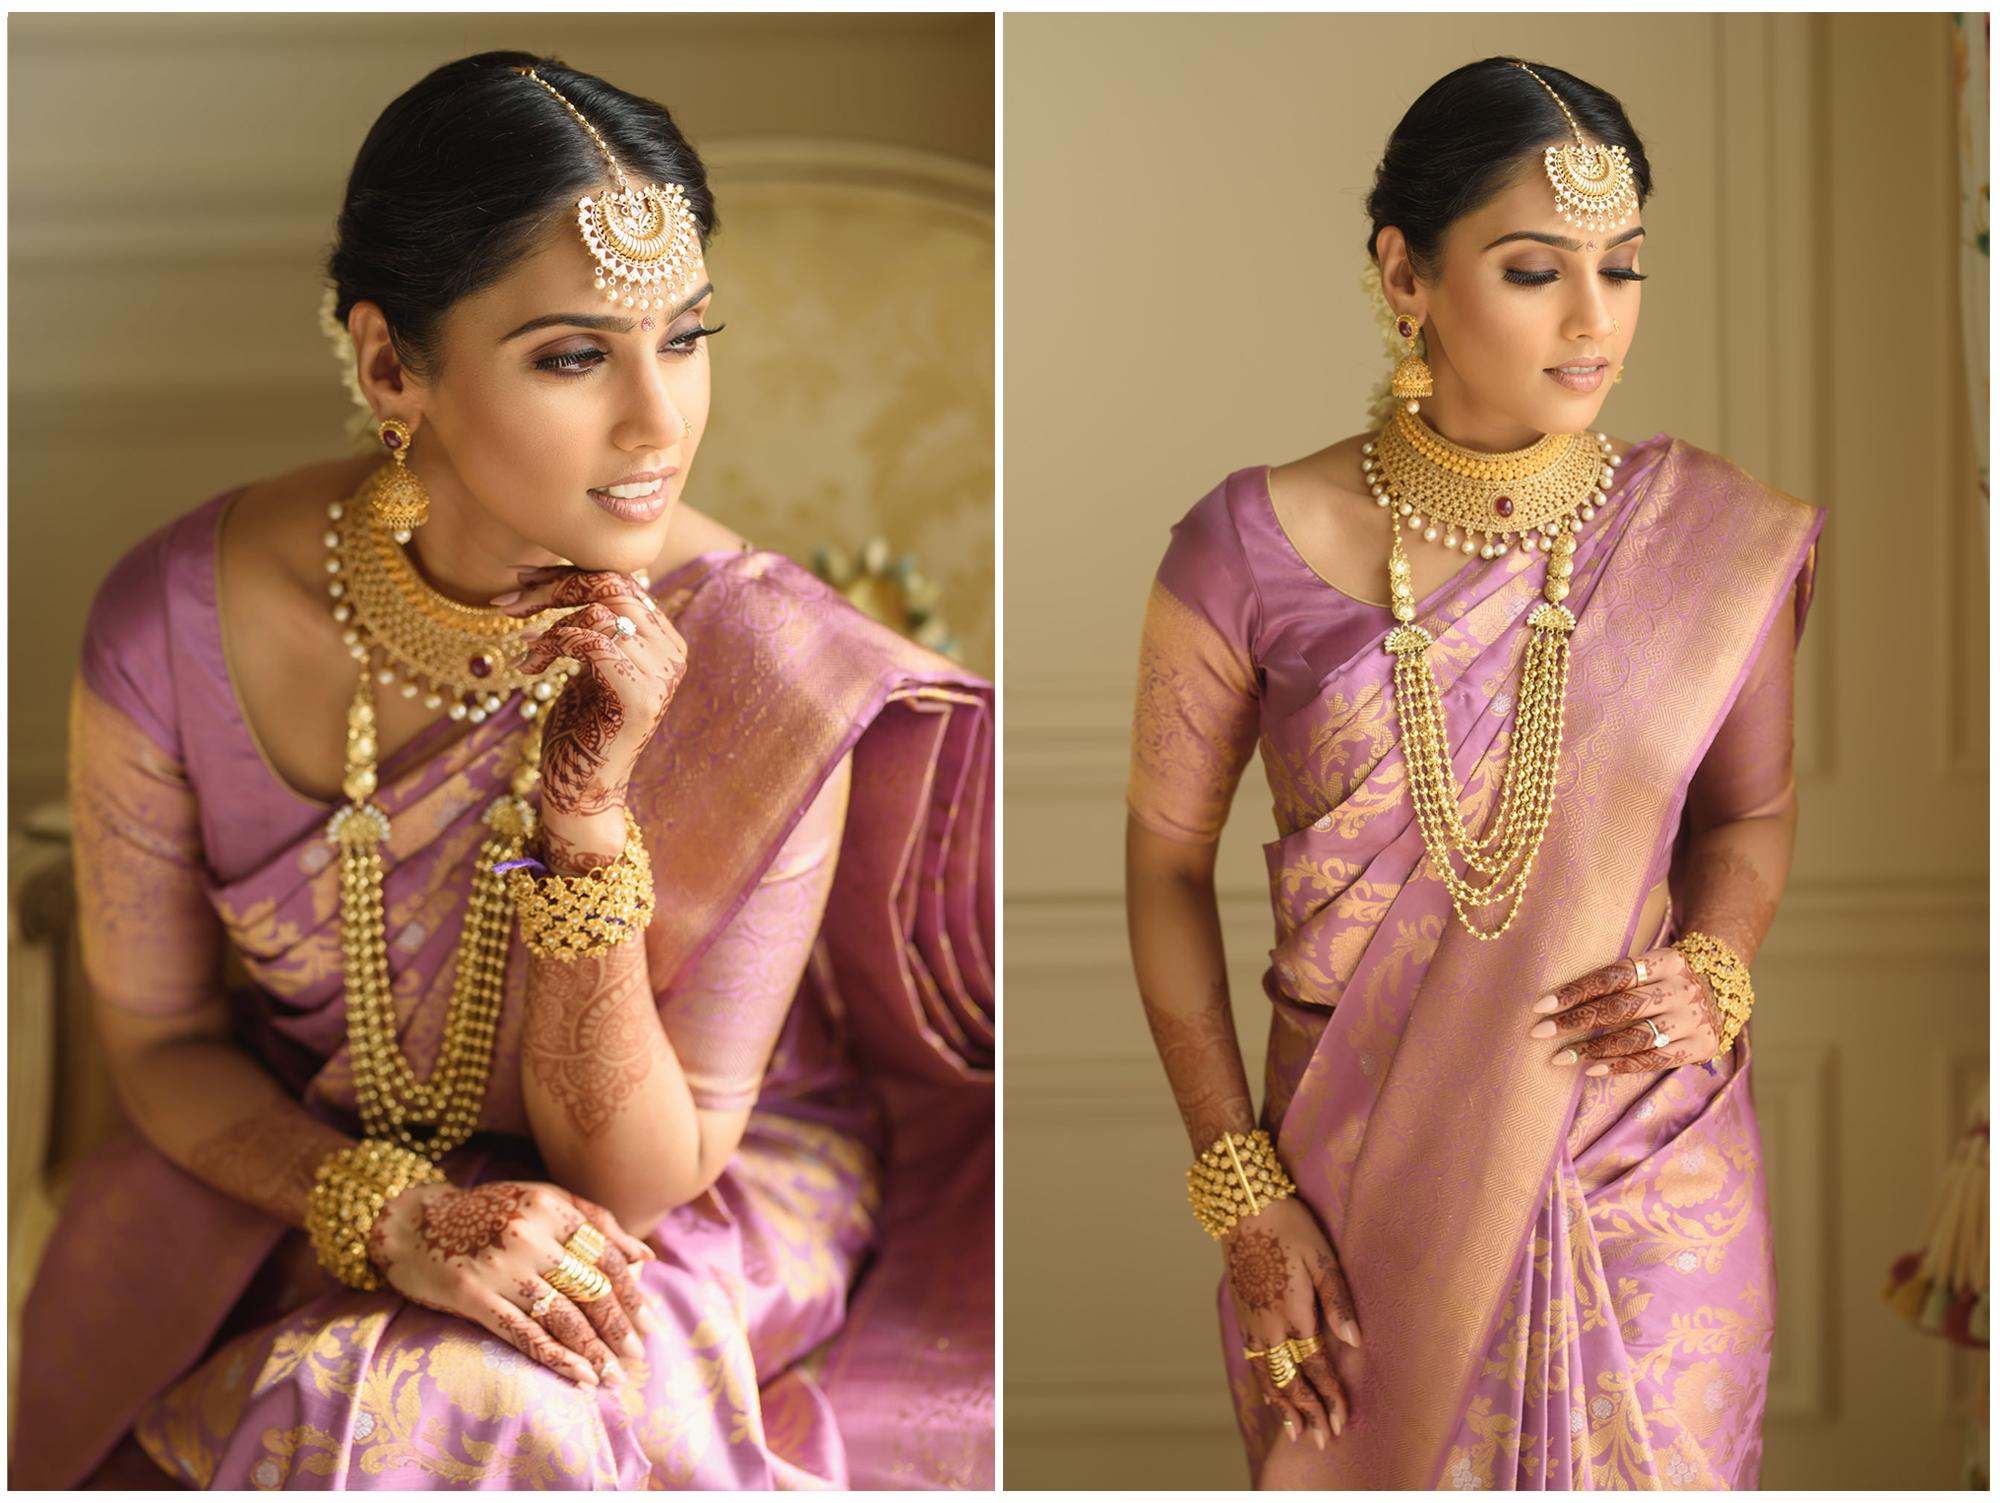 Tamil-Gujrati-hindu-wedding-photography-photographer-london-the-savoy--73.jpg